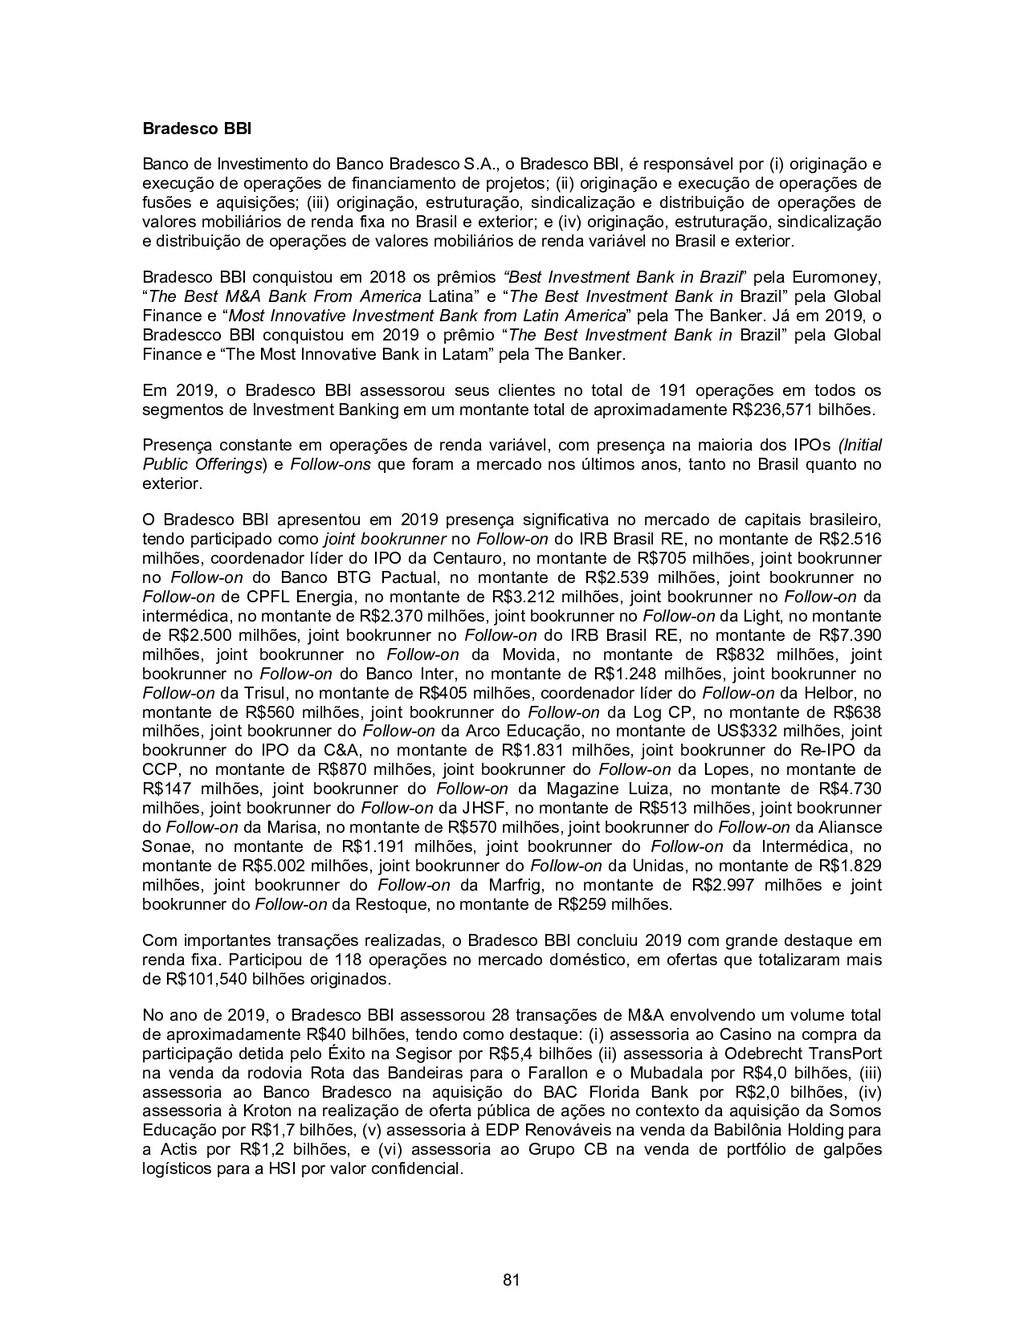 81 Bradesco BBI Banco de Investimento do Banco ...